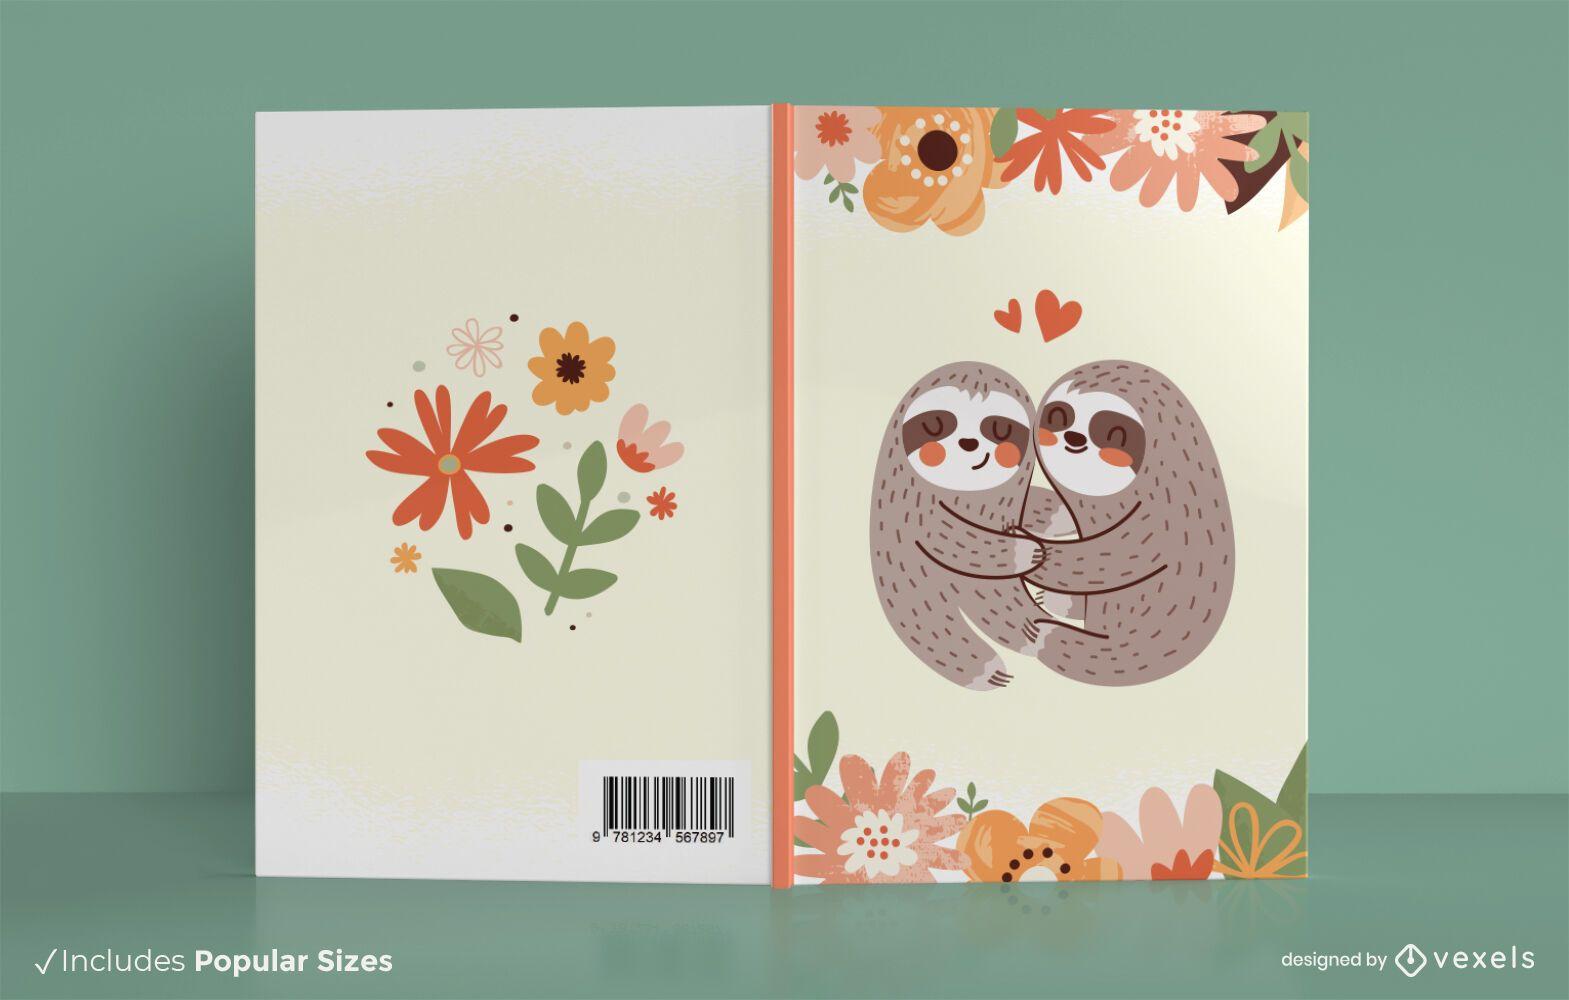 Sloths book cover design